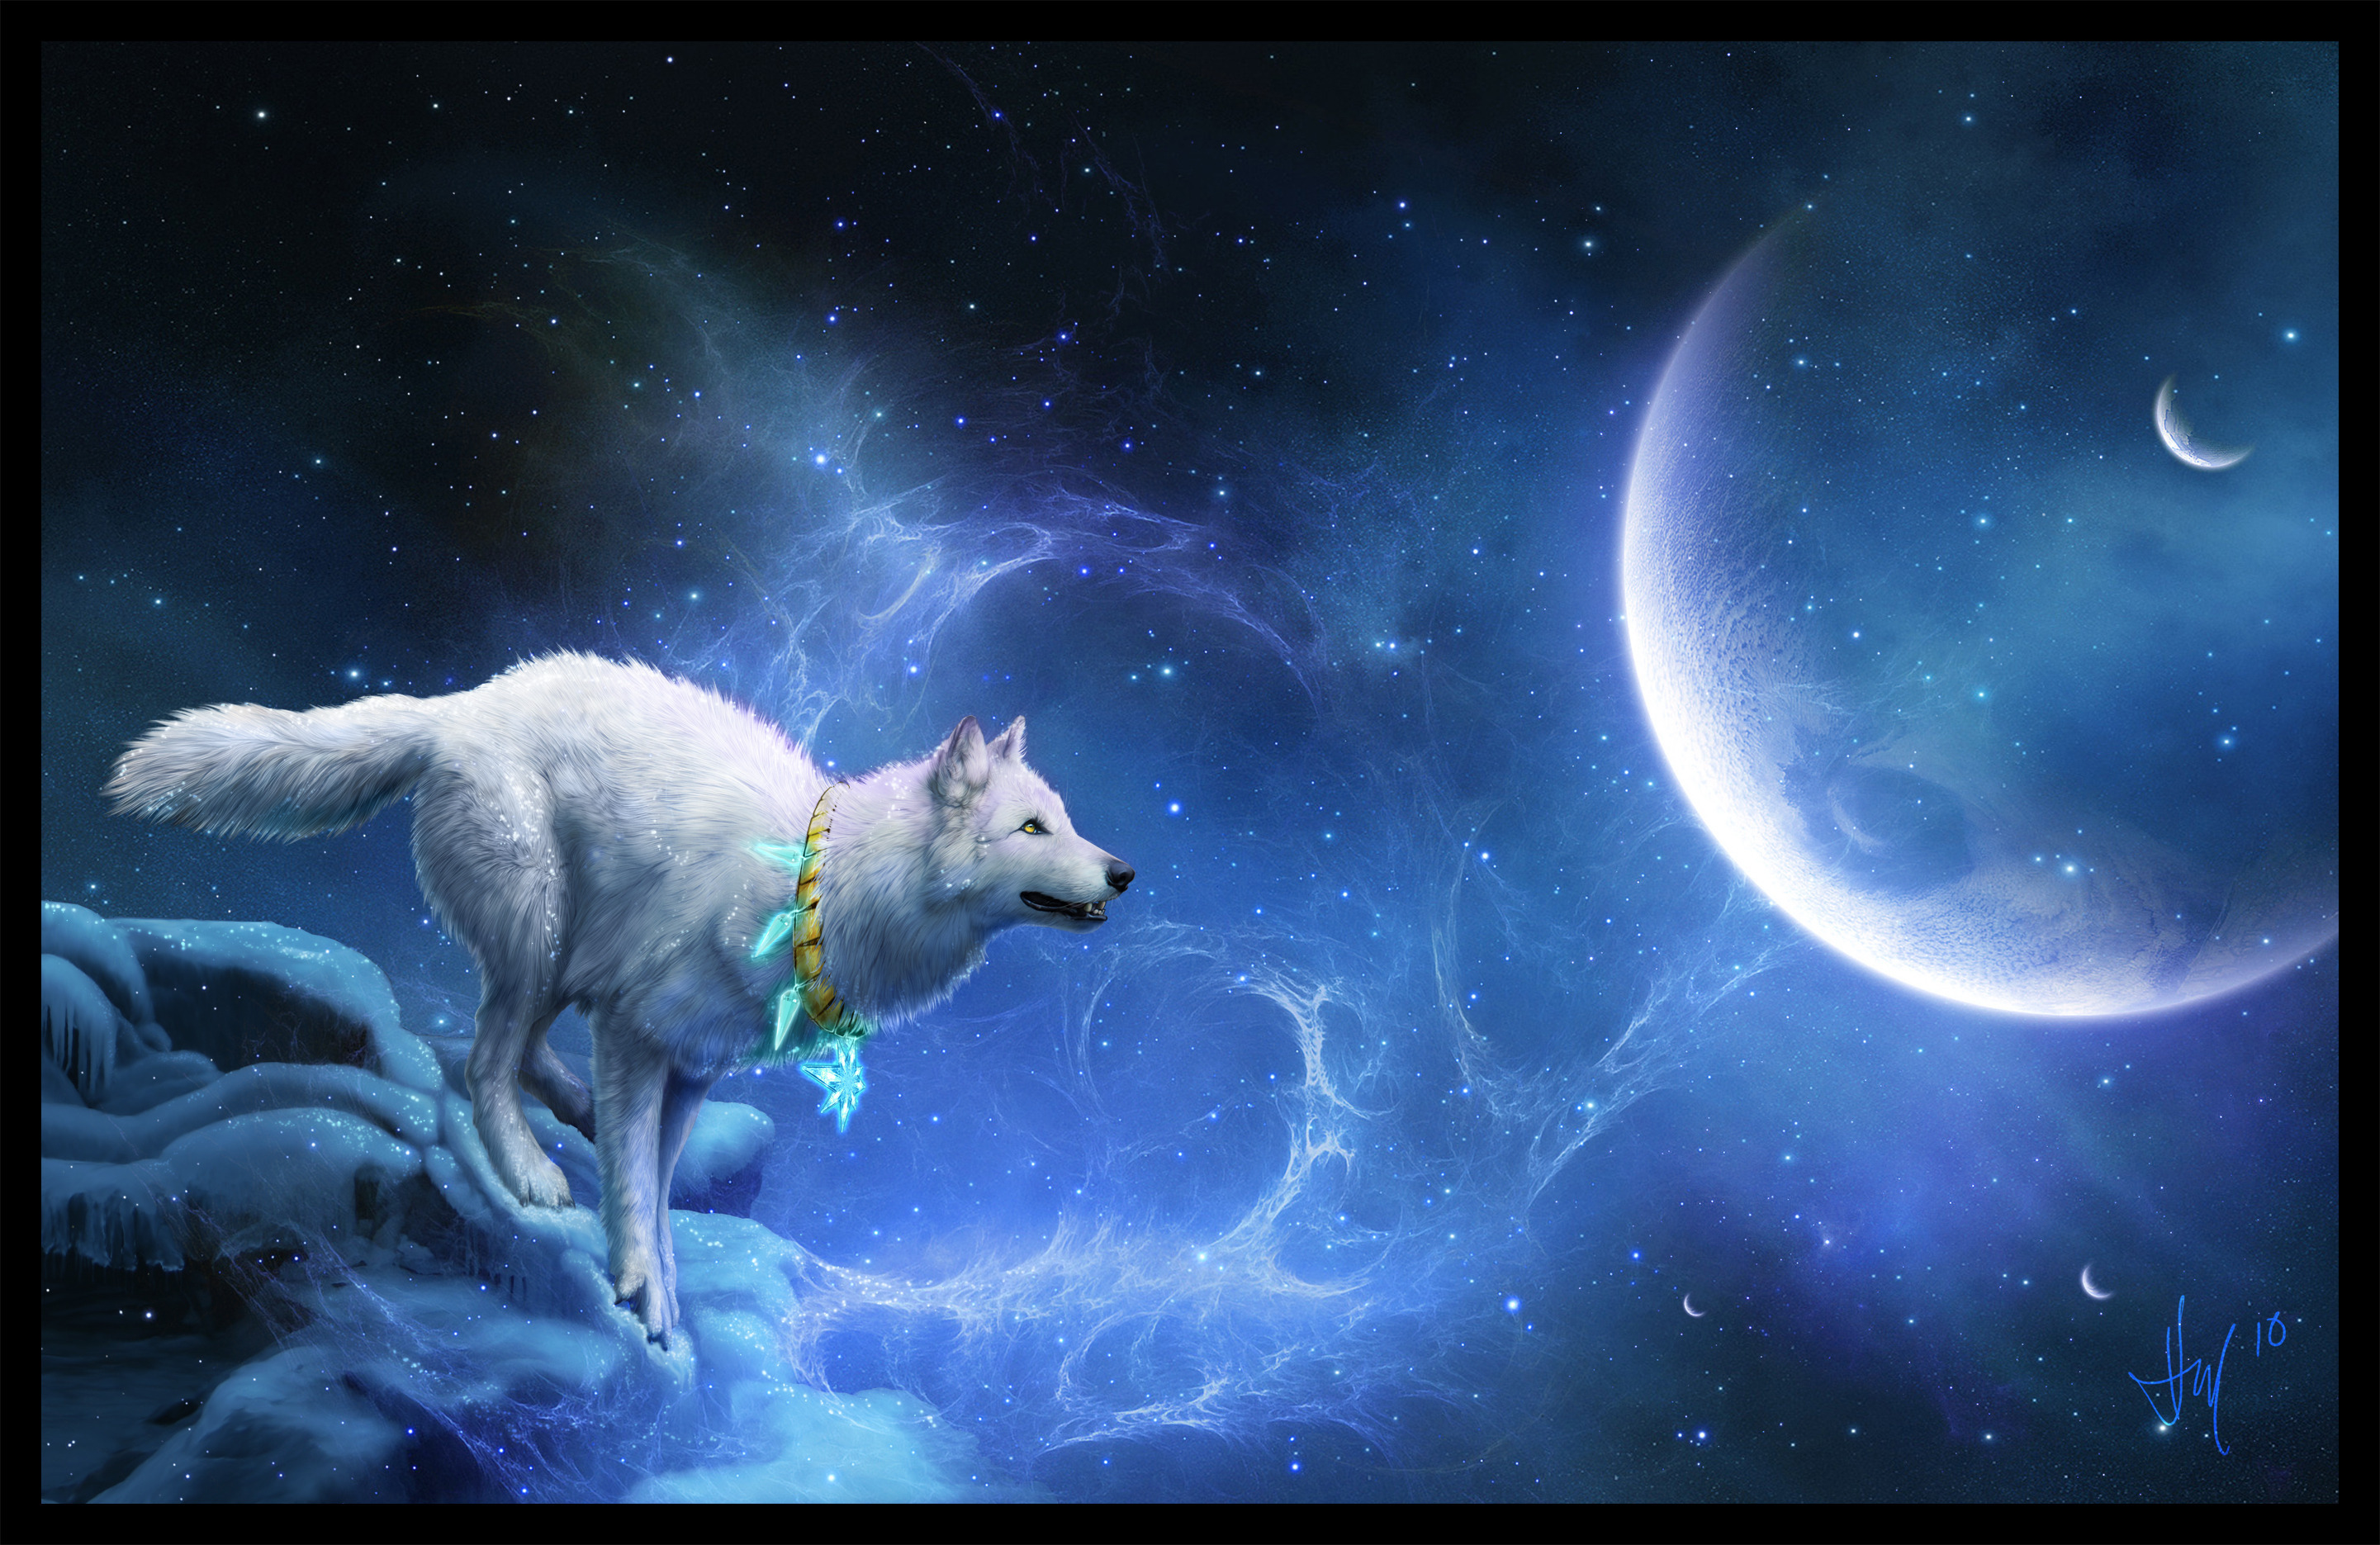 Картинка мистический волк